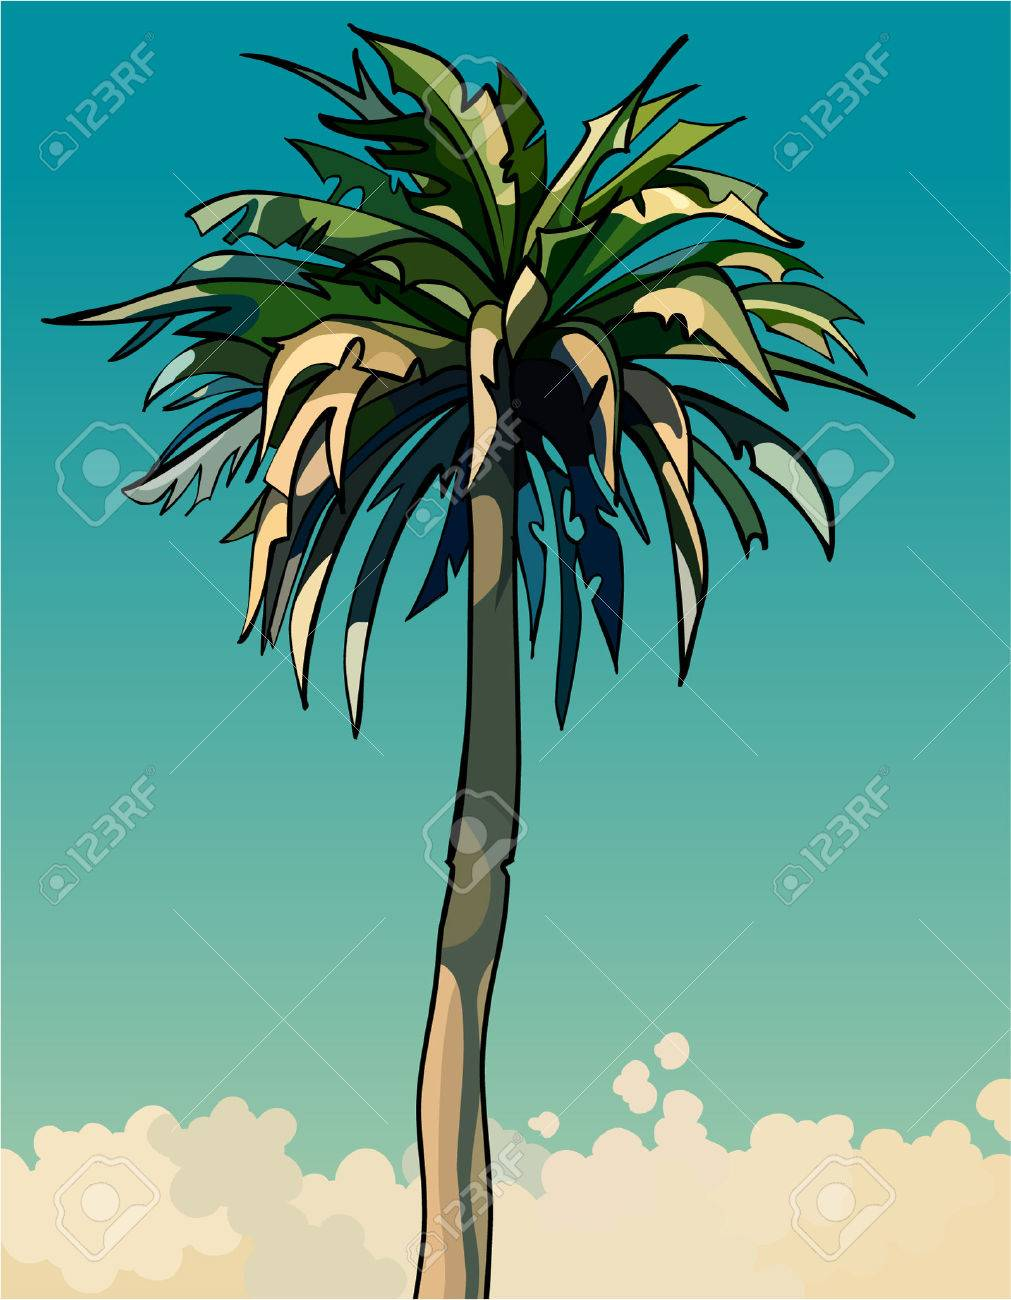 cartoon drawn tall sprawling decorative palm tree - 66771759